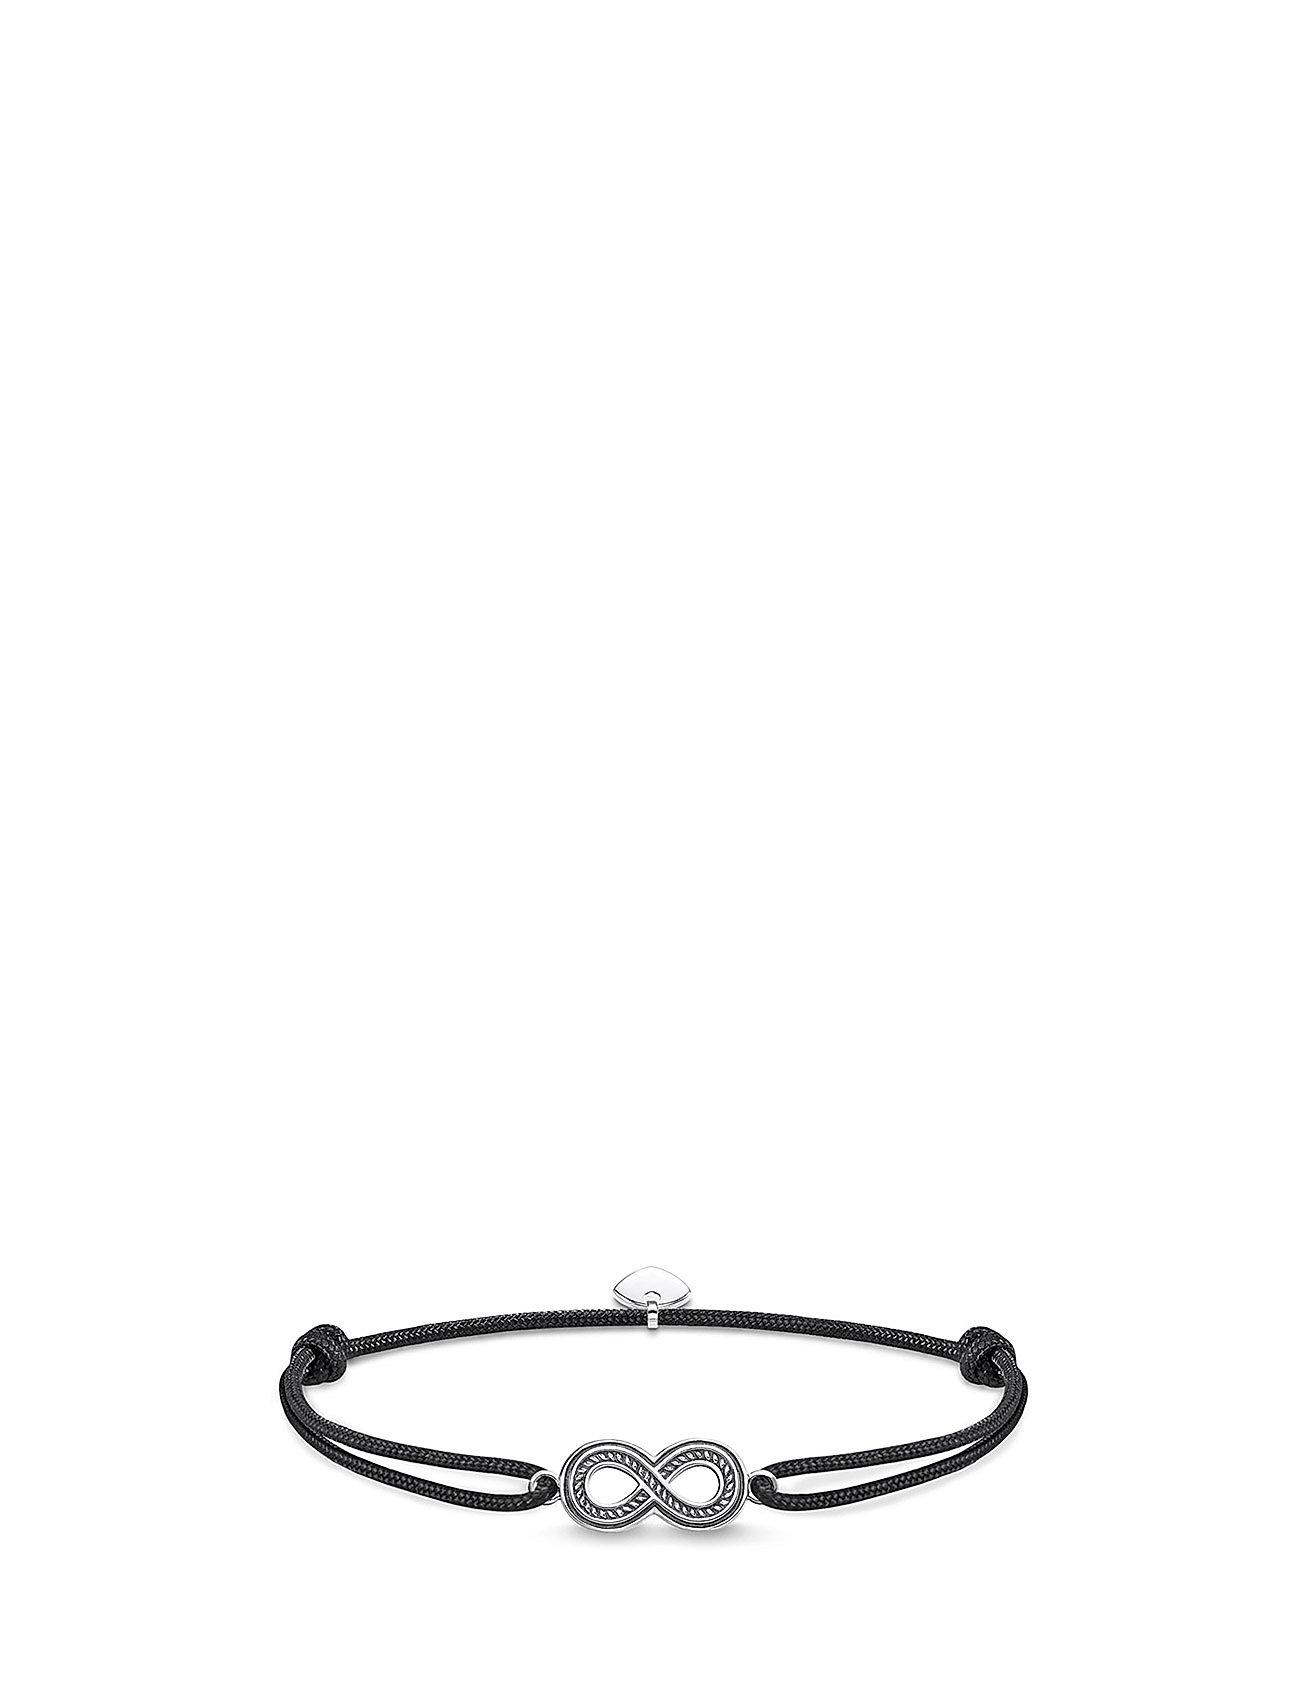 Image of Bracelet Little Secret Infinity Accessories Jewellery Bracelets Chain Bracelets Sølv Thomas Sabo (3046212309)